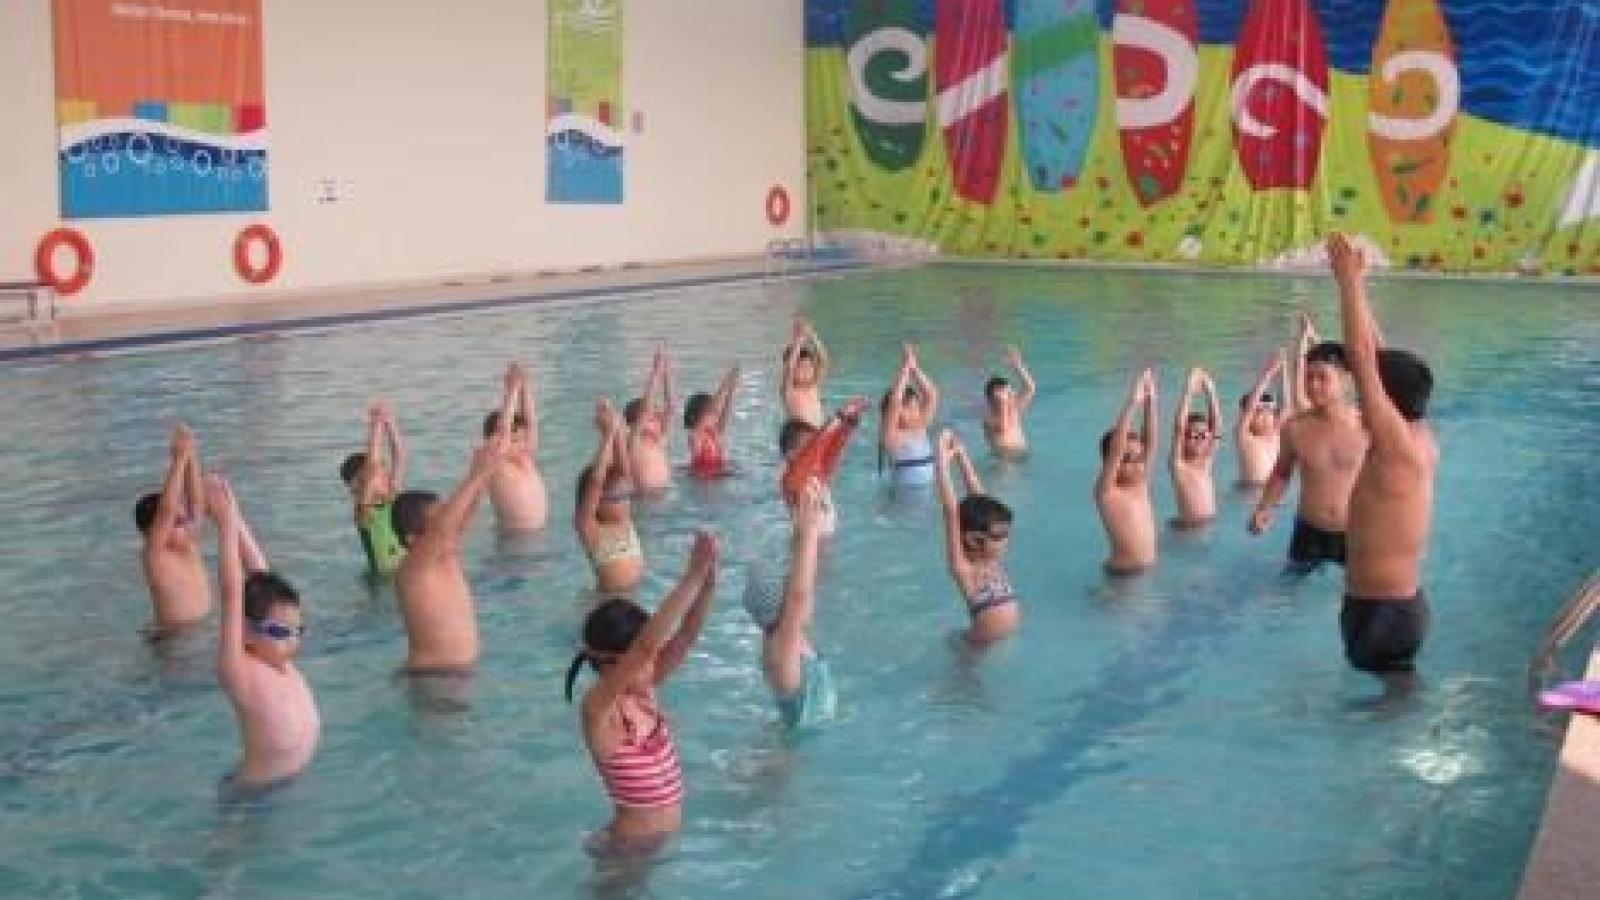 Dong Thap popularises swimming skills for children